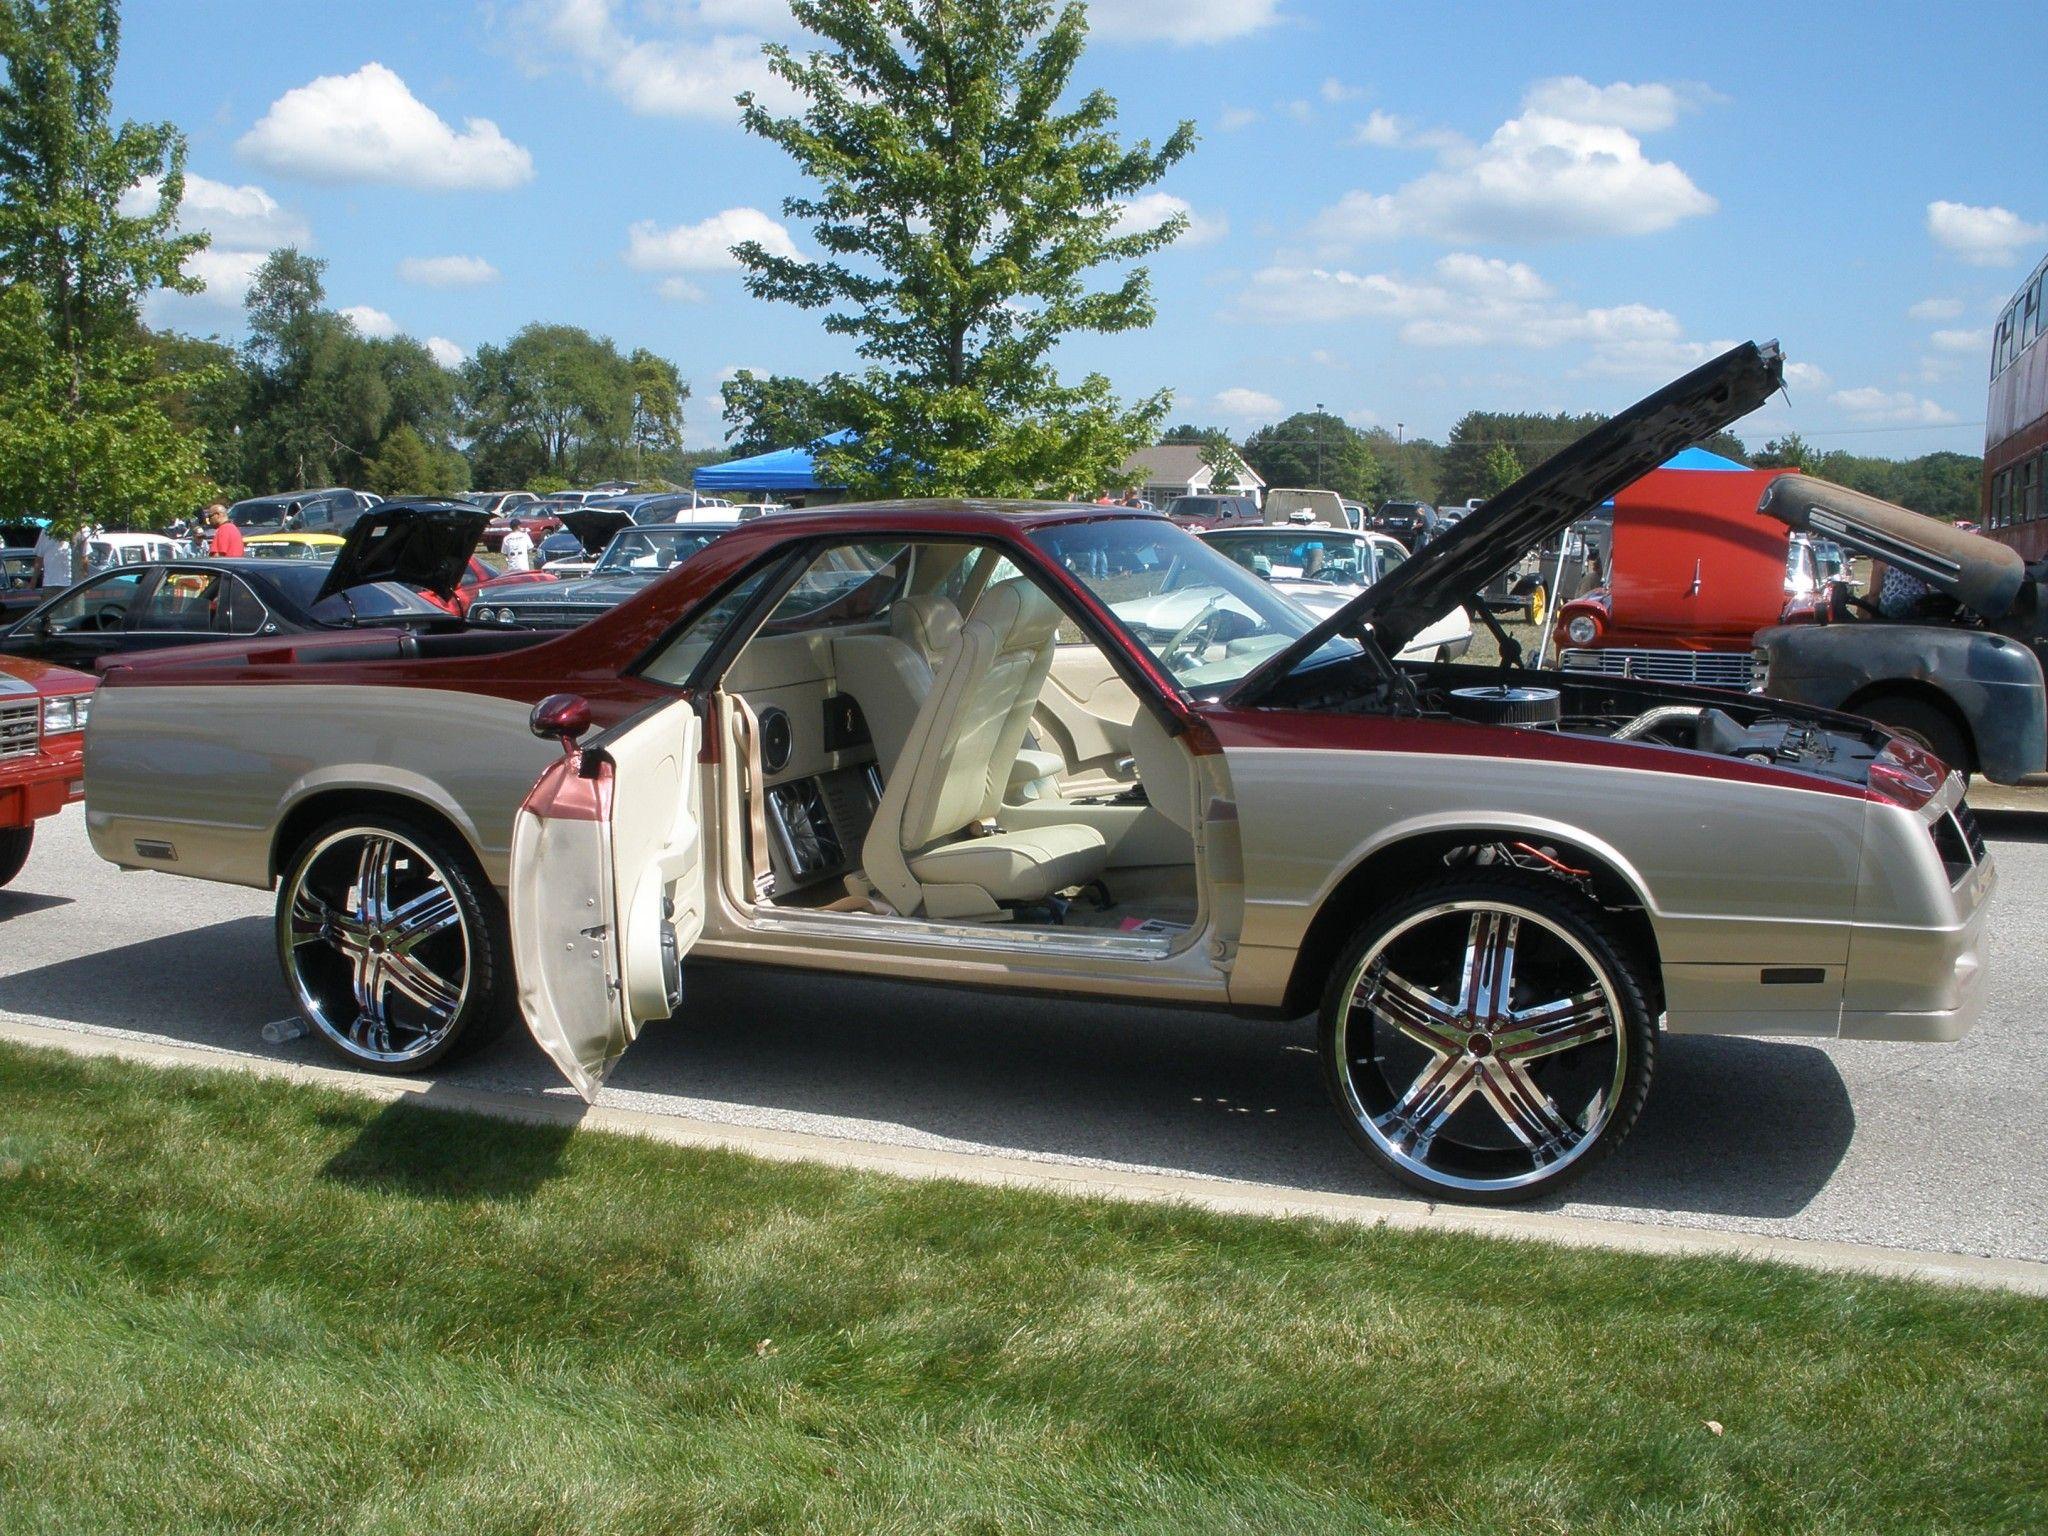 hight resolution of 30 inch rims on impala box chevy on 30 inch ballers wheels big rims custom wheels